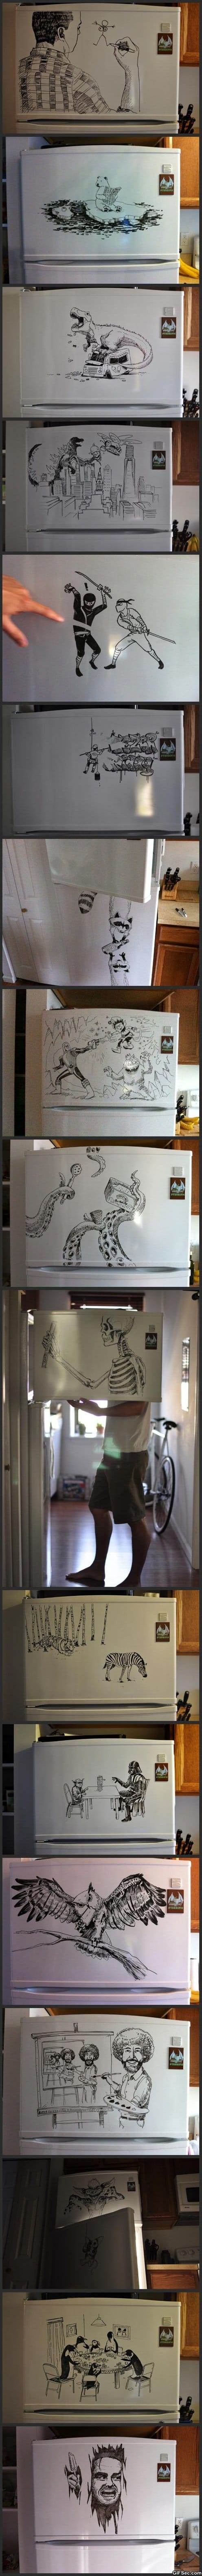 freezer-art